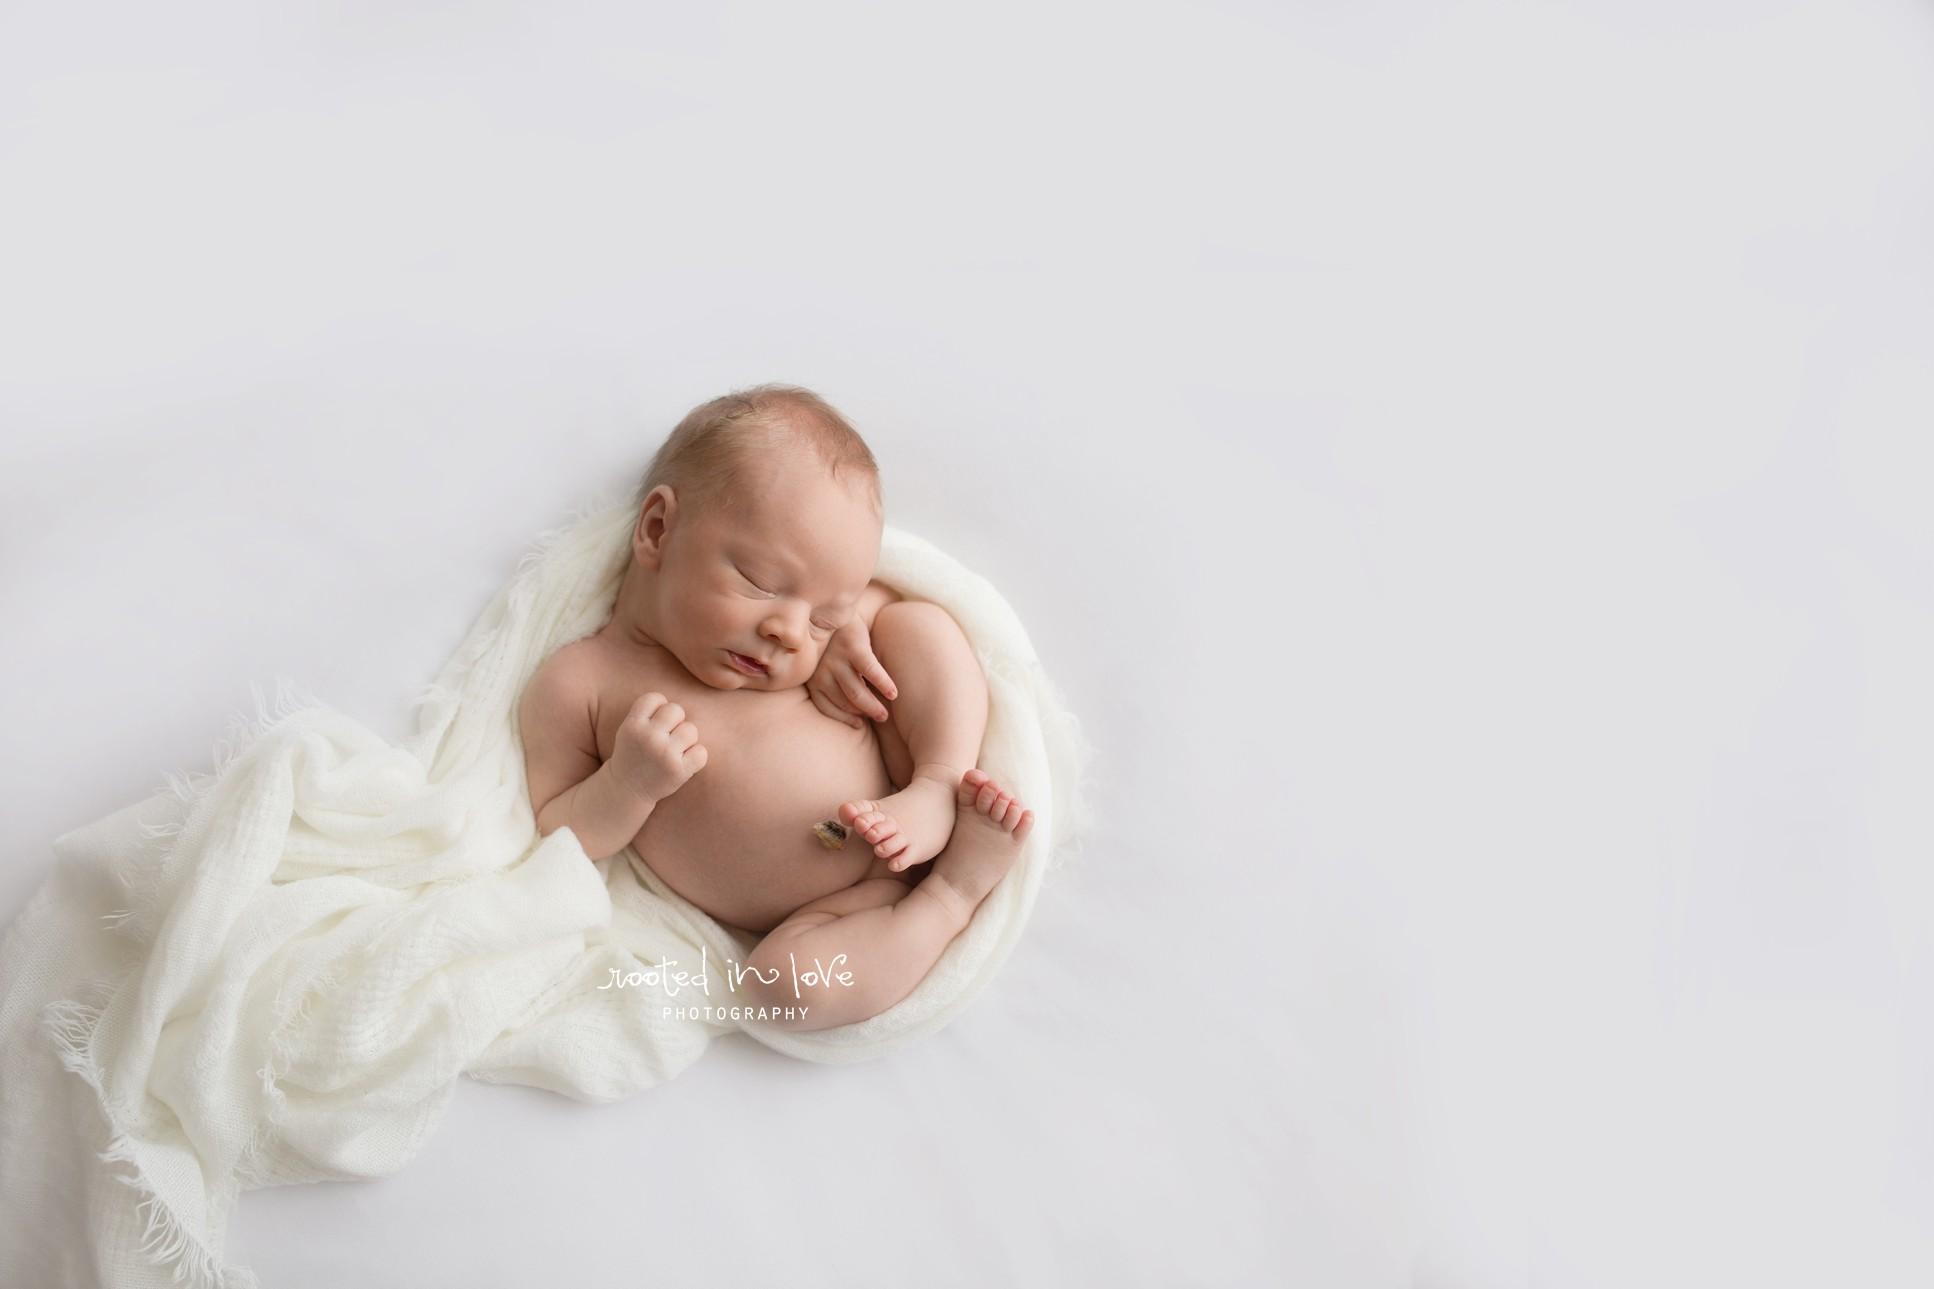 Coy's newborn session